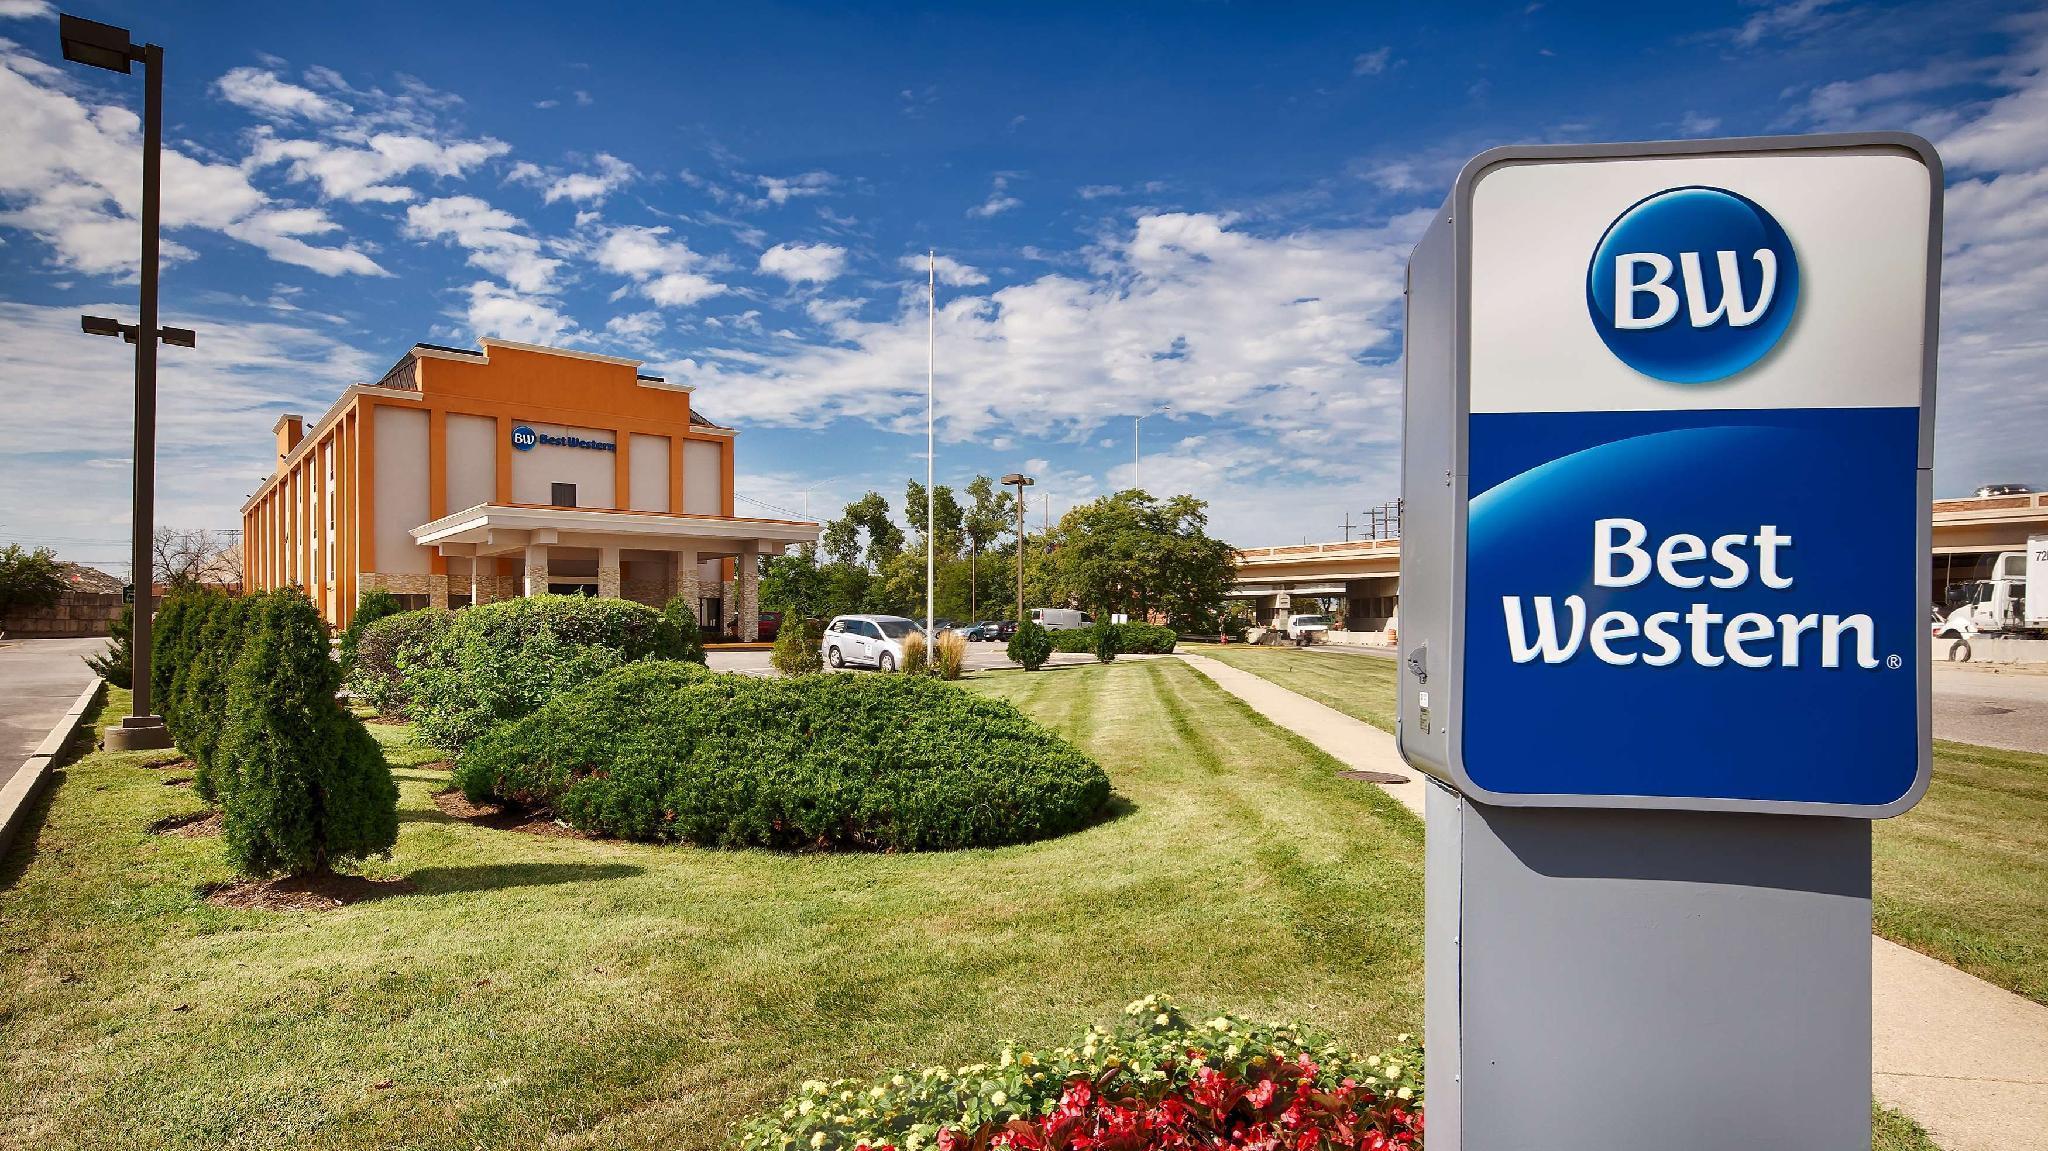 Best Western O'Hare Elk Grove Hotel